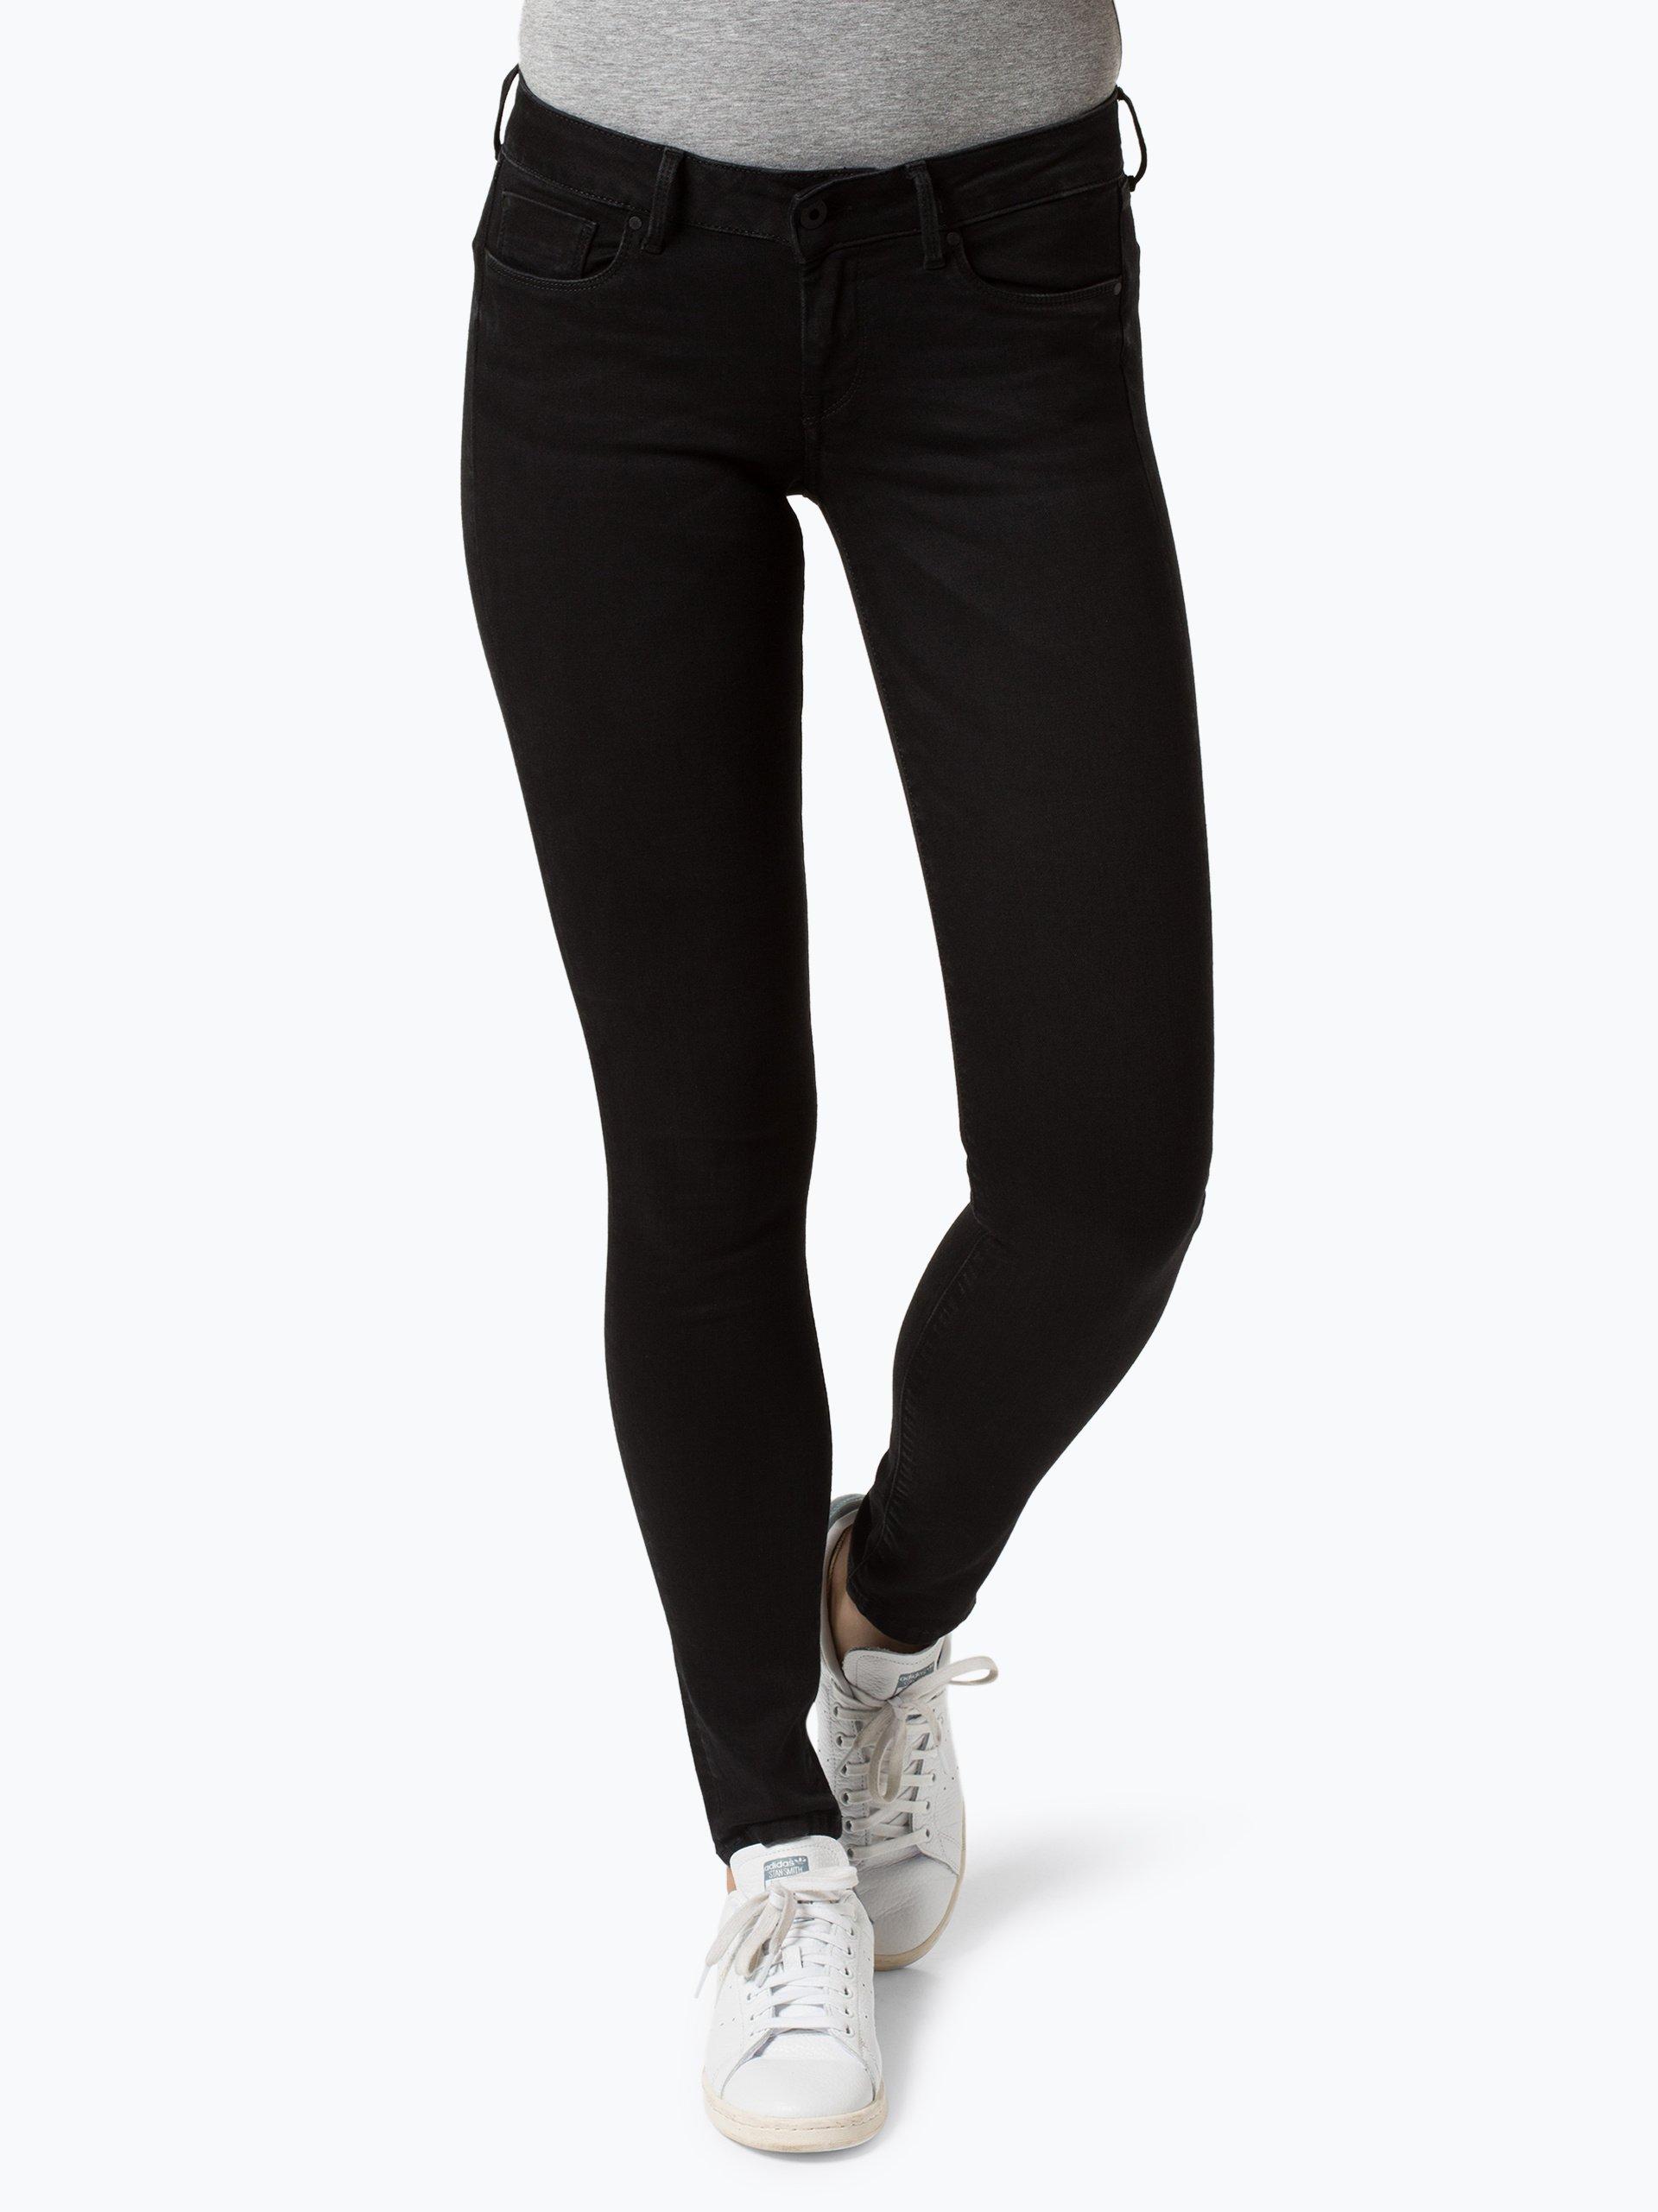 Pepe Jeans Damen Jeans - Soho